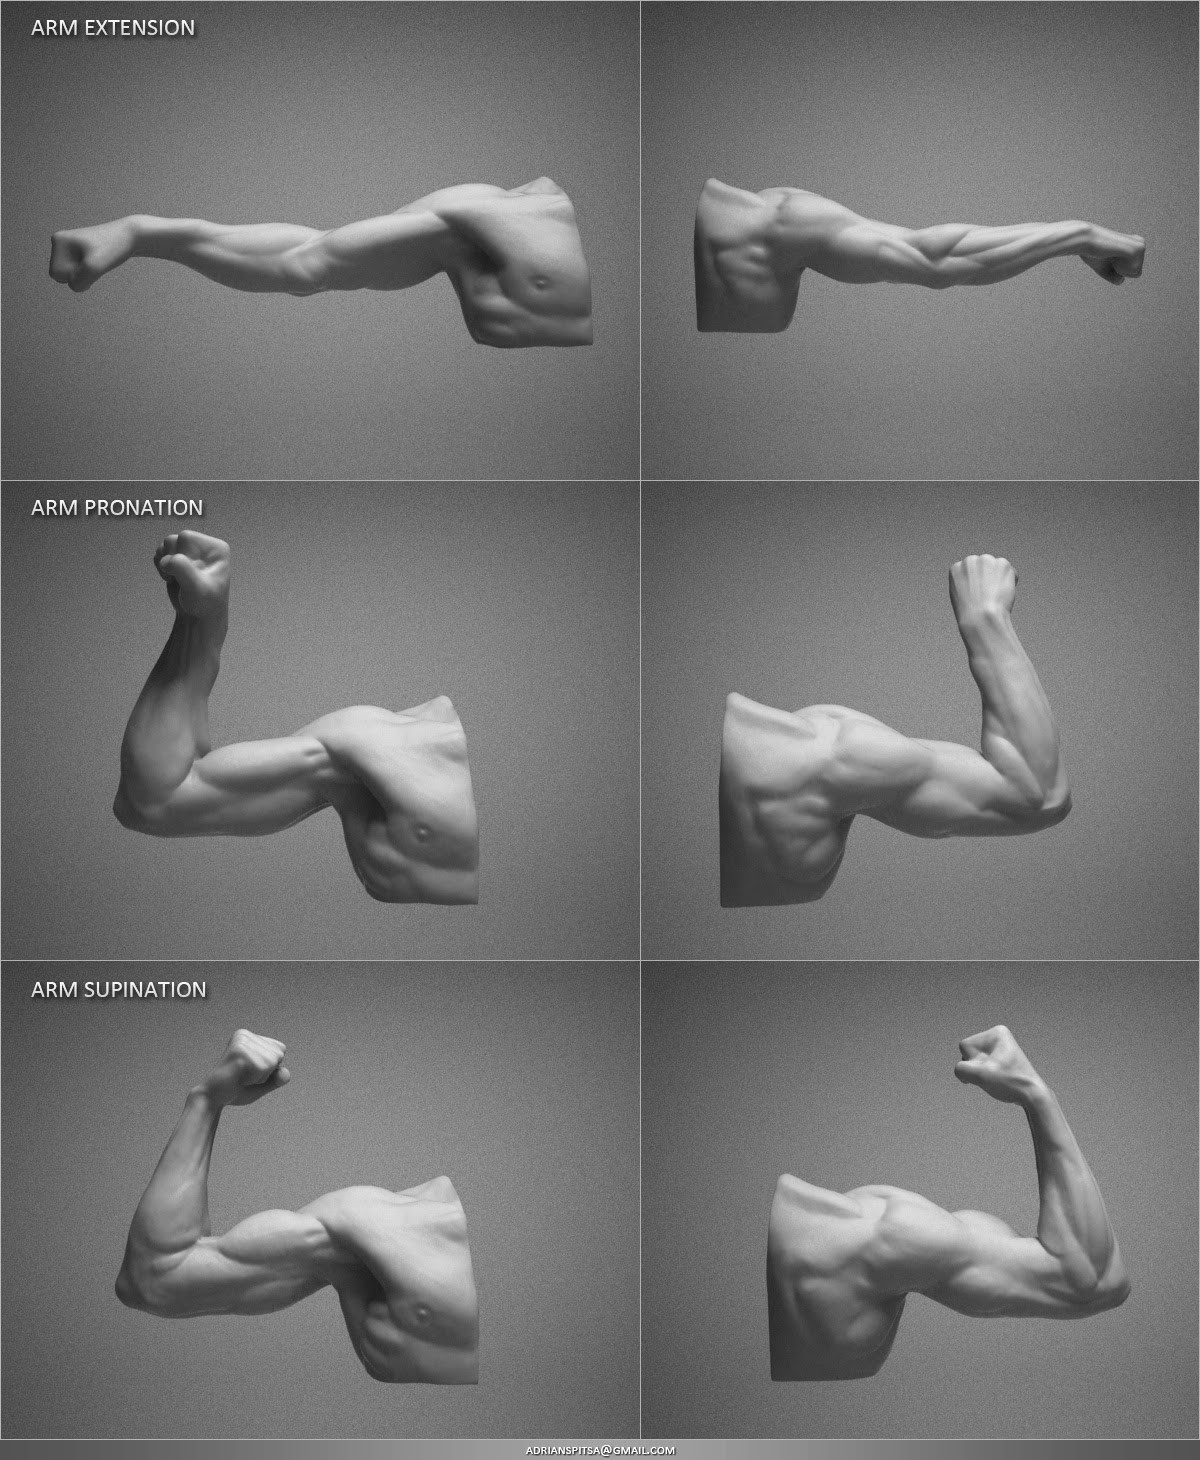 Adrian spitsa arm studies